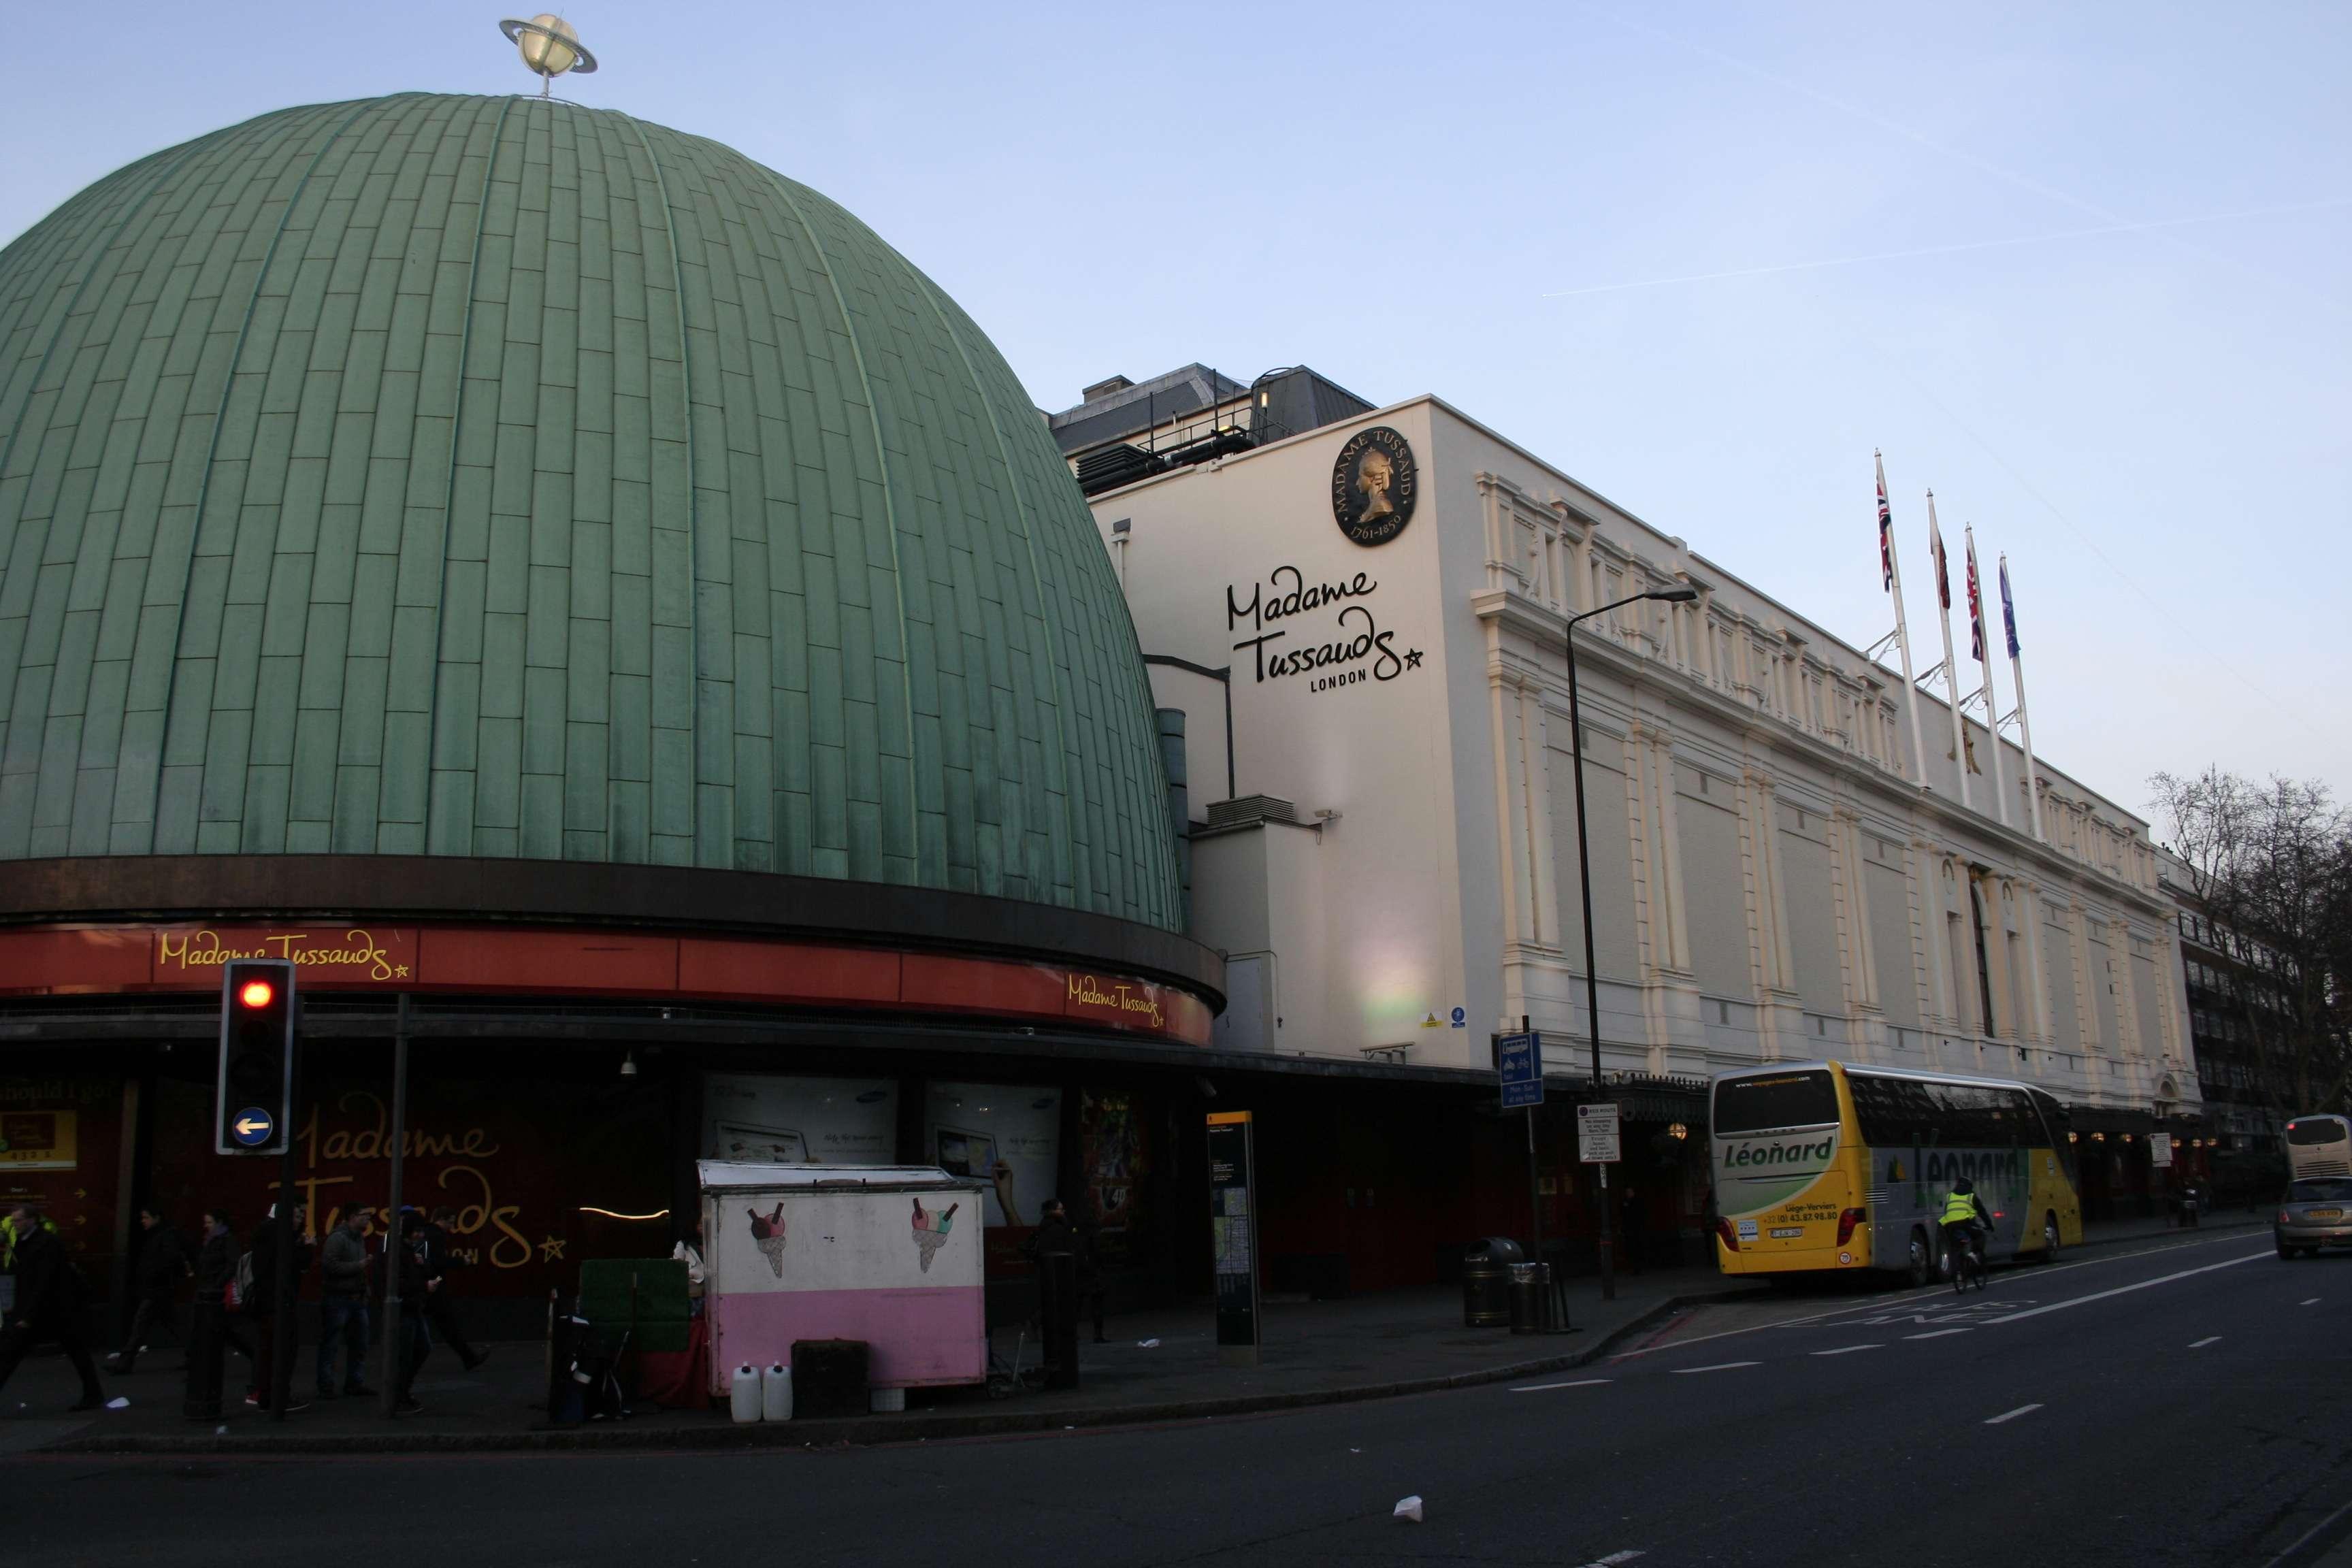 London_0014 Musee Tussaud